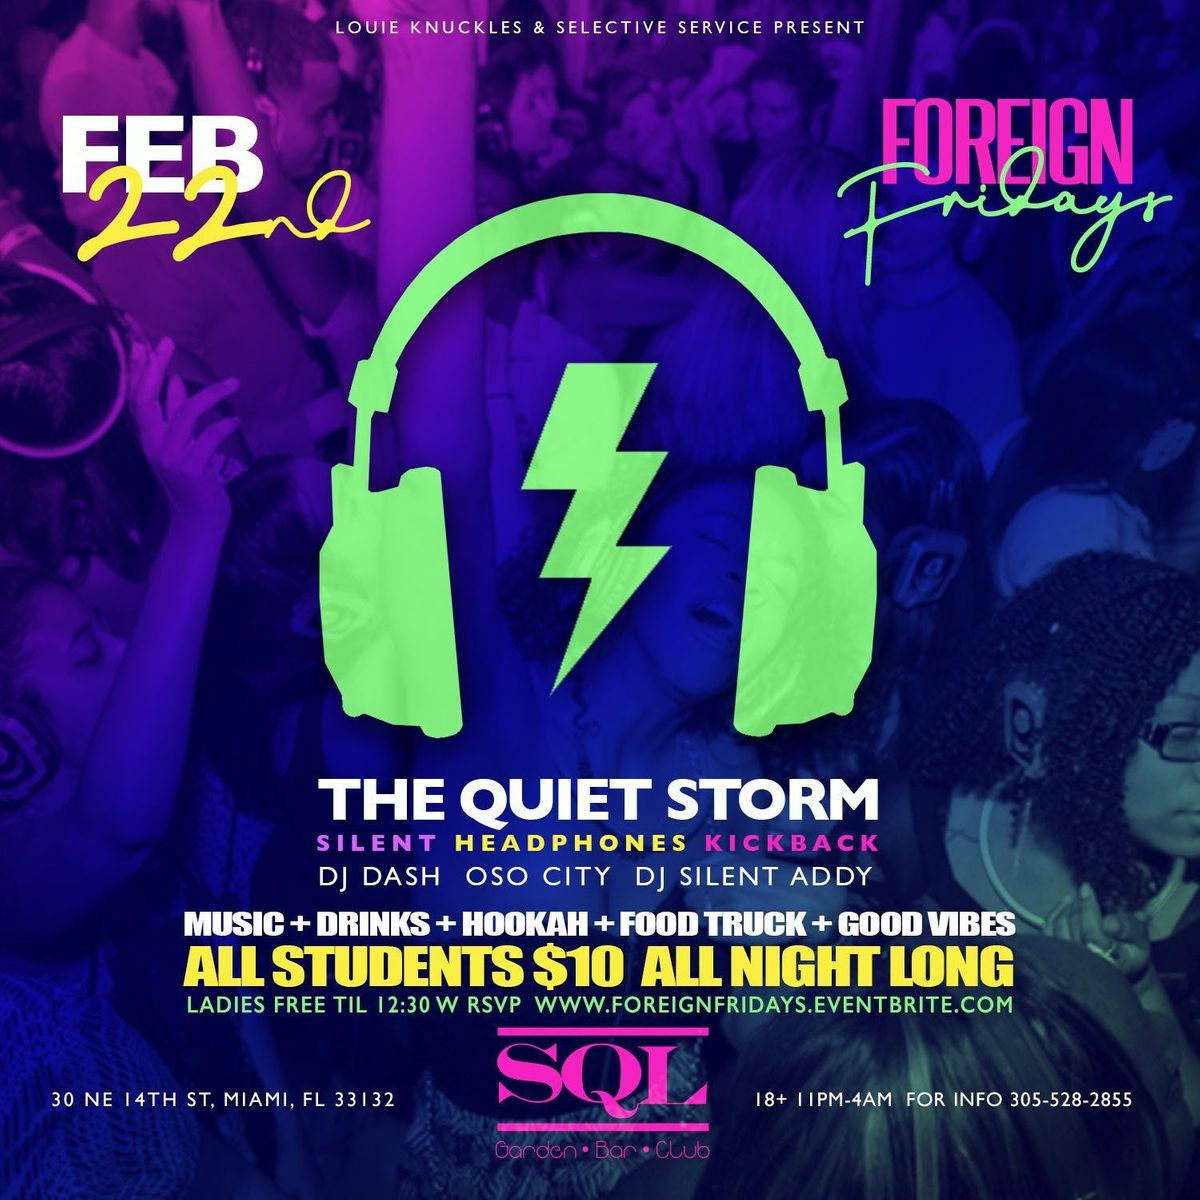 Foreign Fridays Quiet Storm Headphones Party